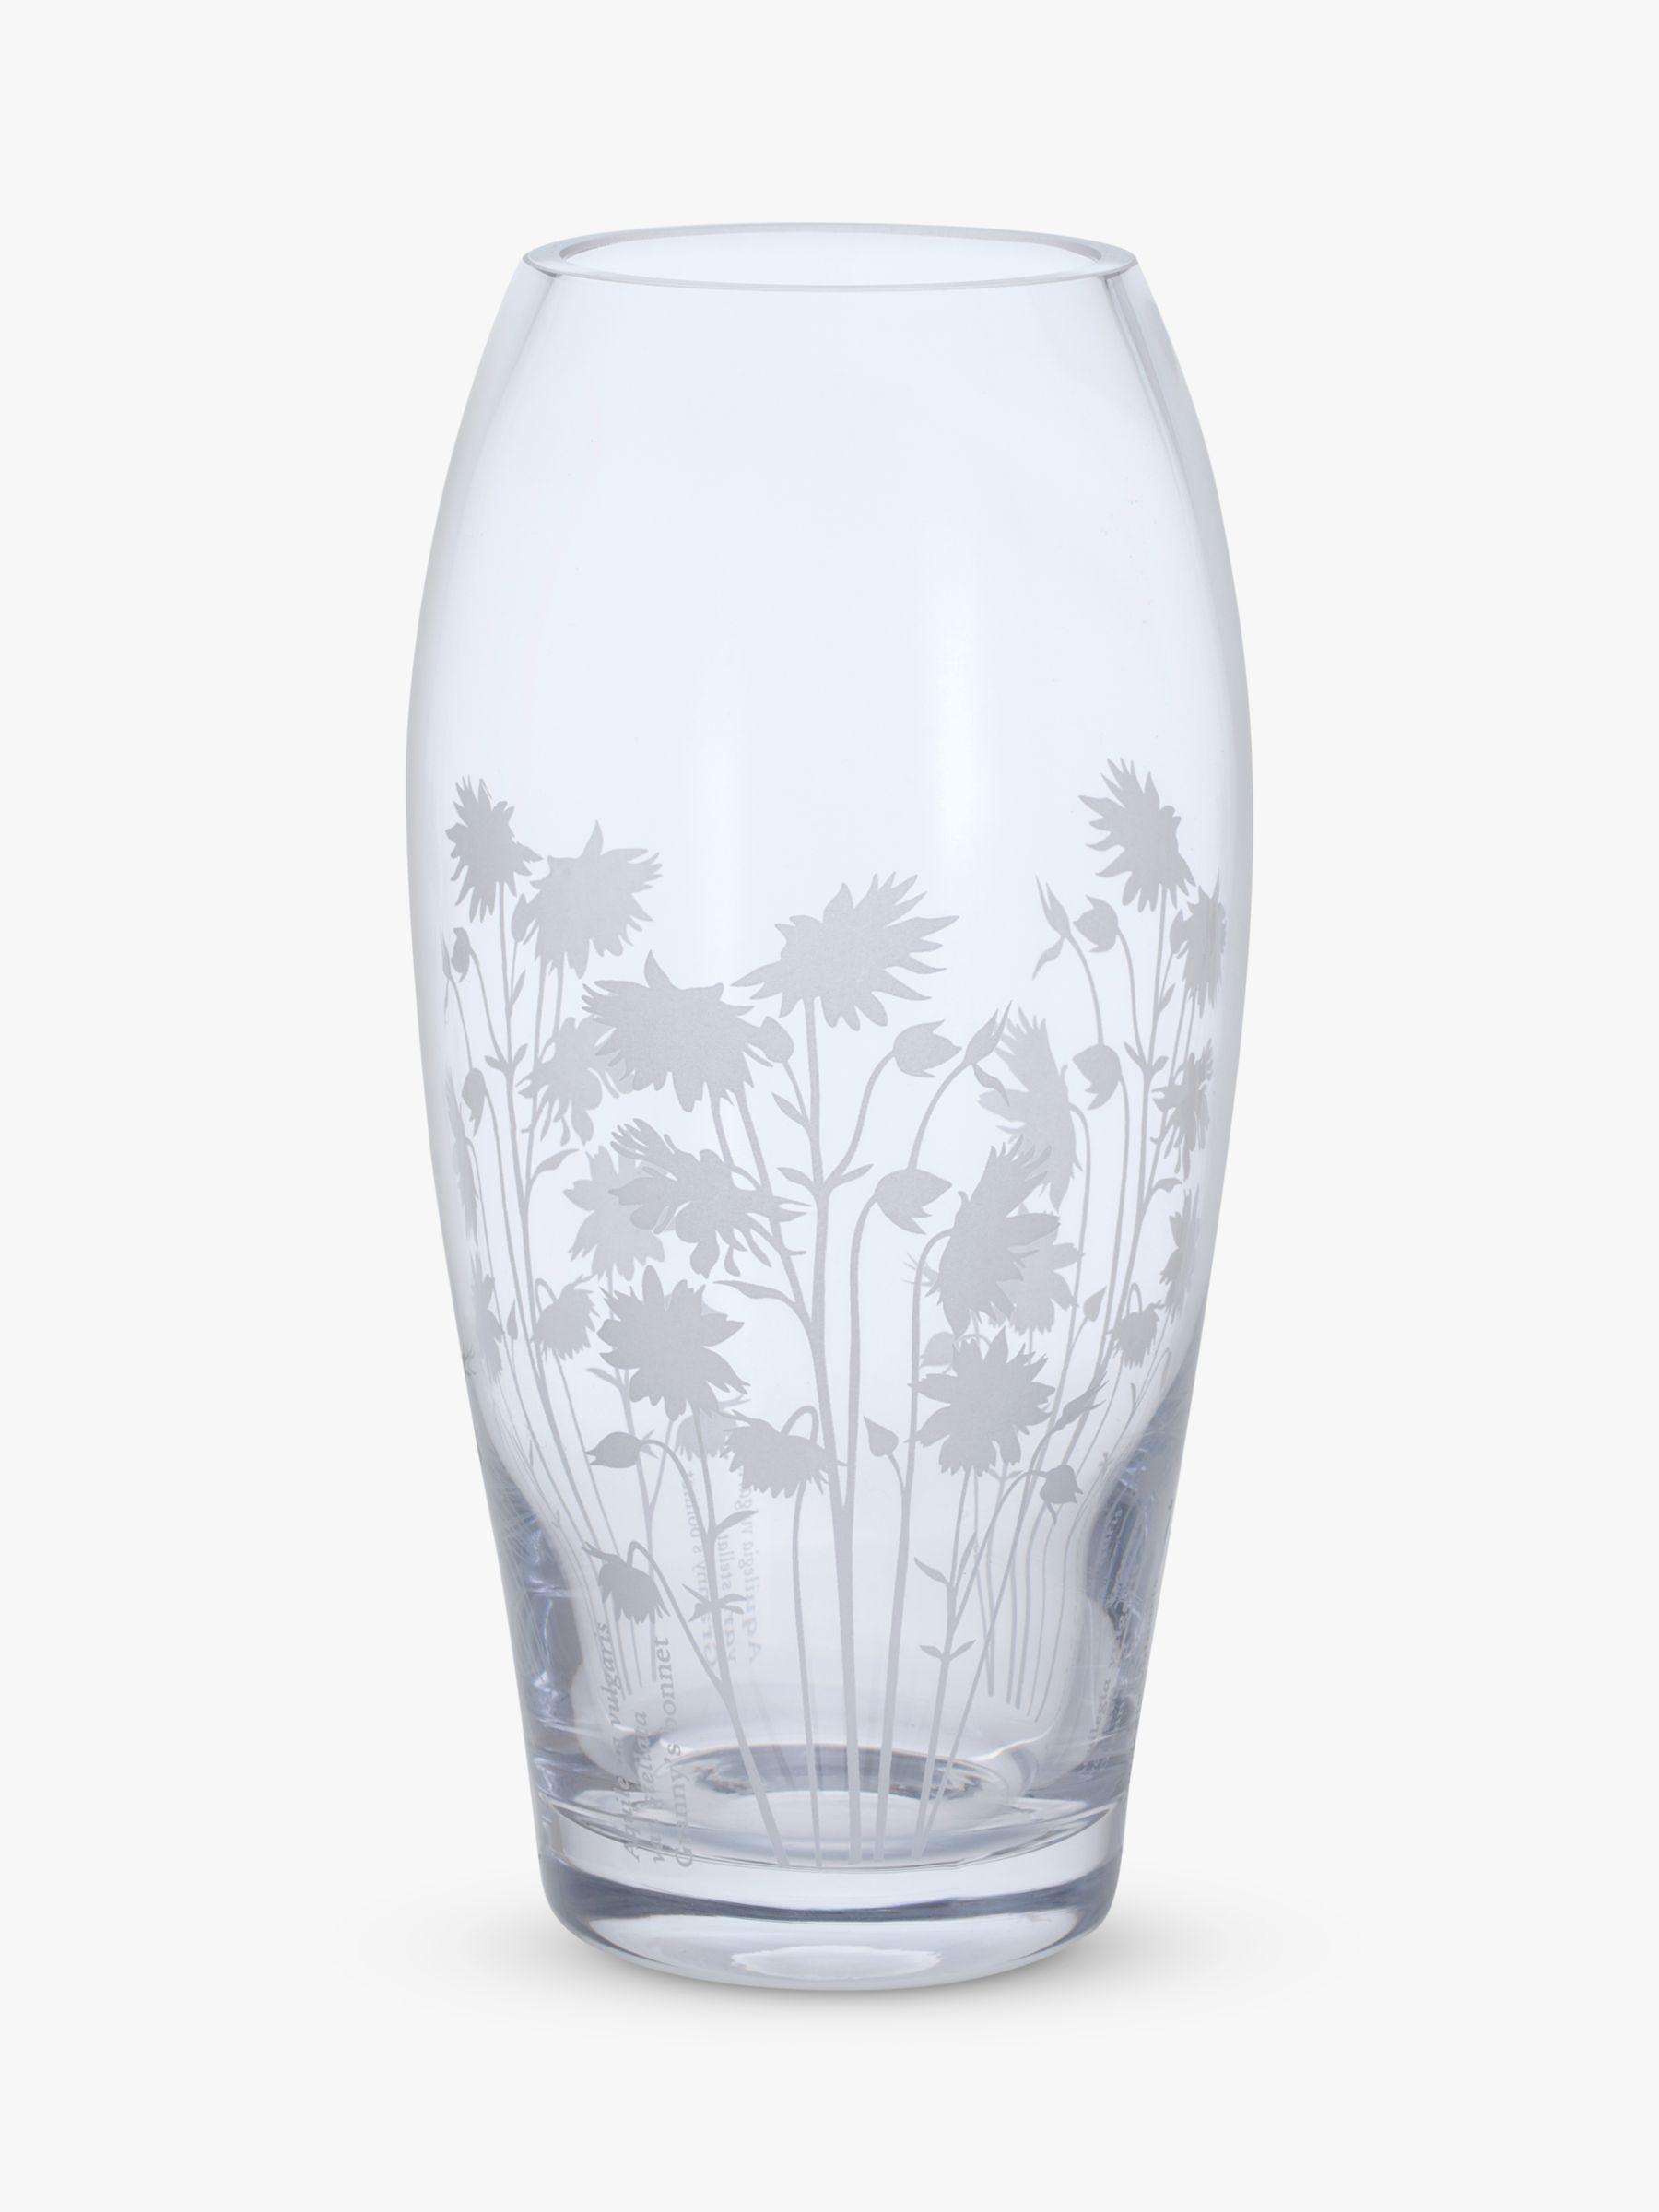 Dartington Crystal Dartington Crystal Bloom Aguilegia Glass Barrel Vase, H22cm, Clear